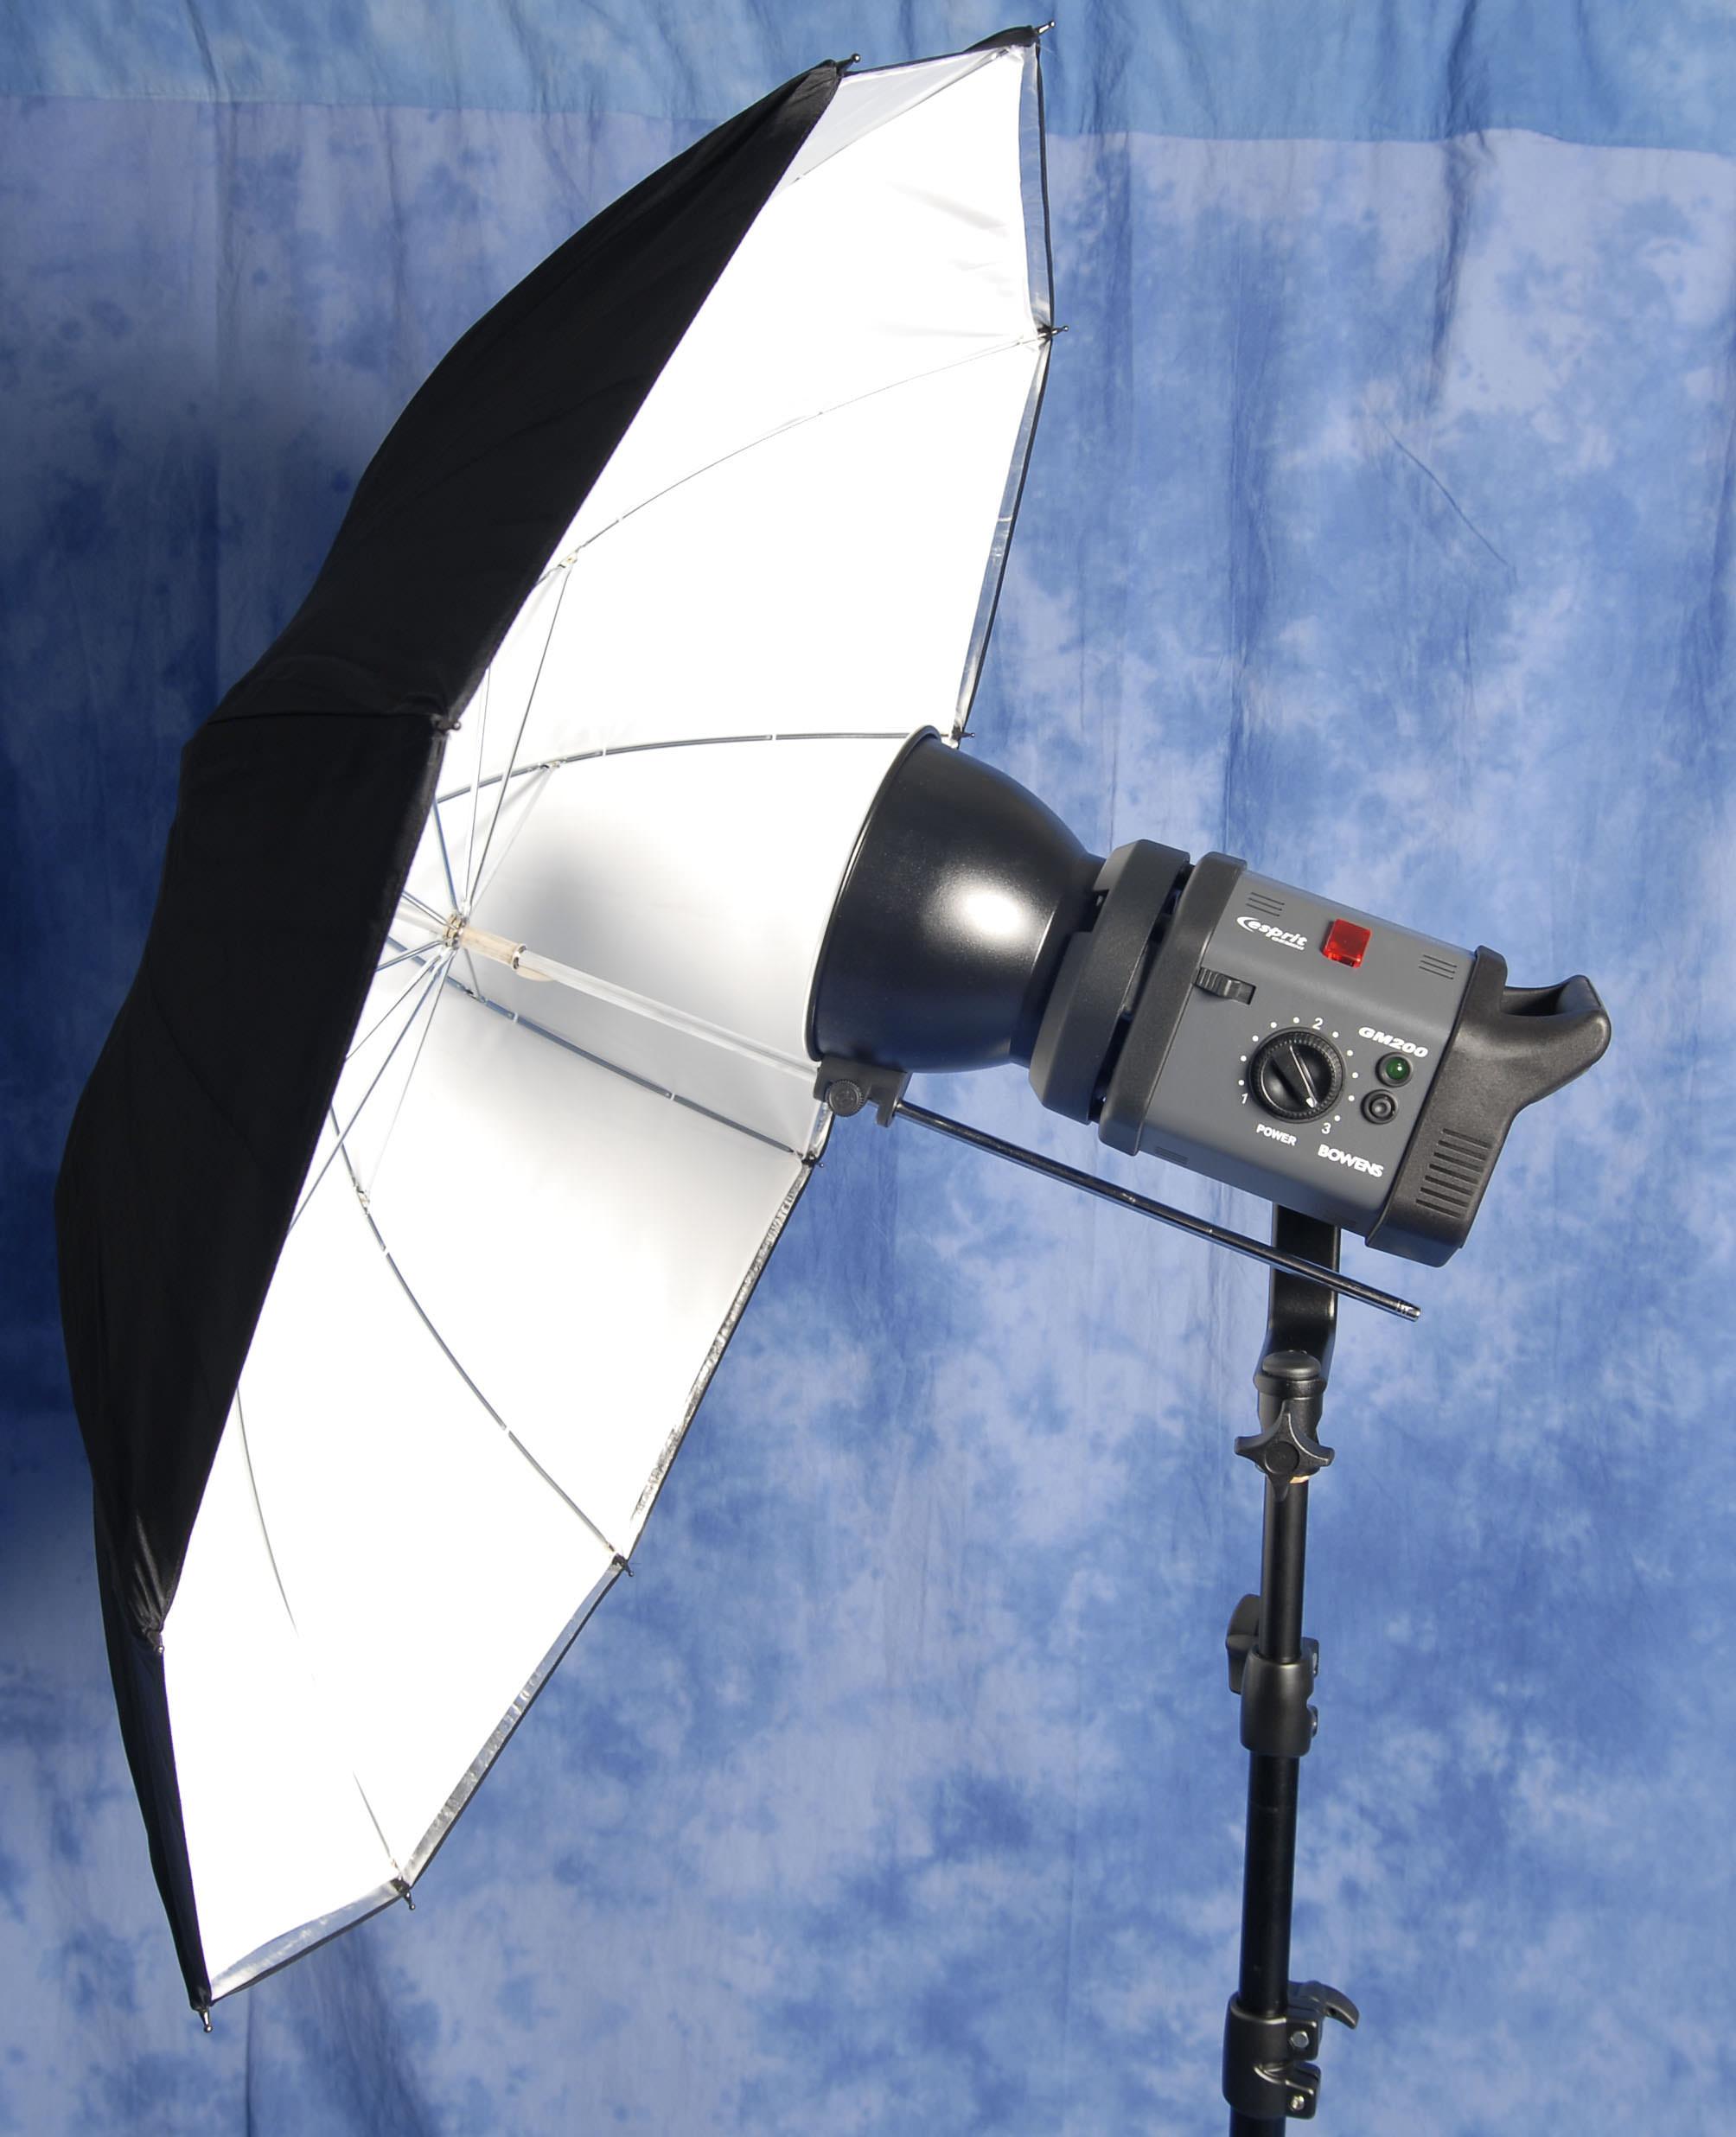 Studio Lighting Reviews: Bowens Esprit Gemini Studio-in-a-Box 200 Studio Lighting